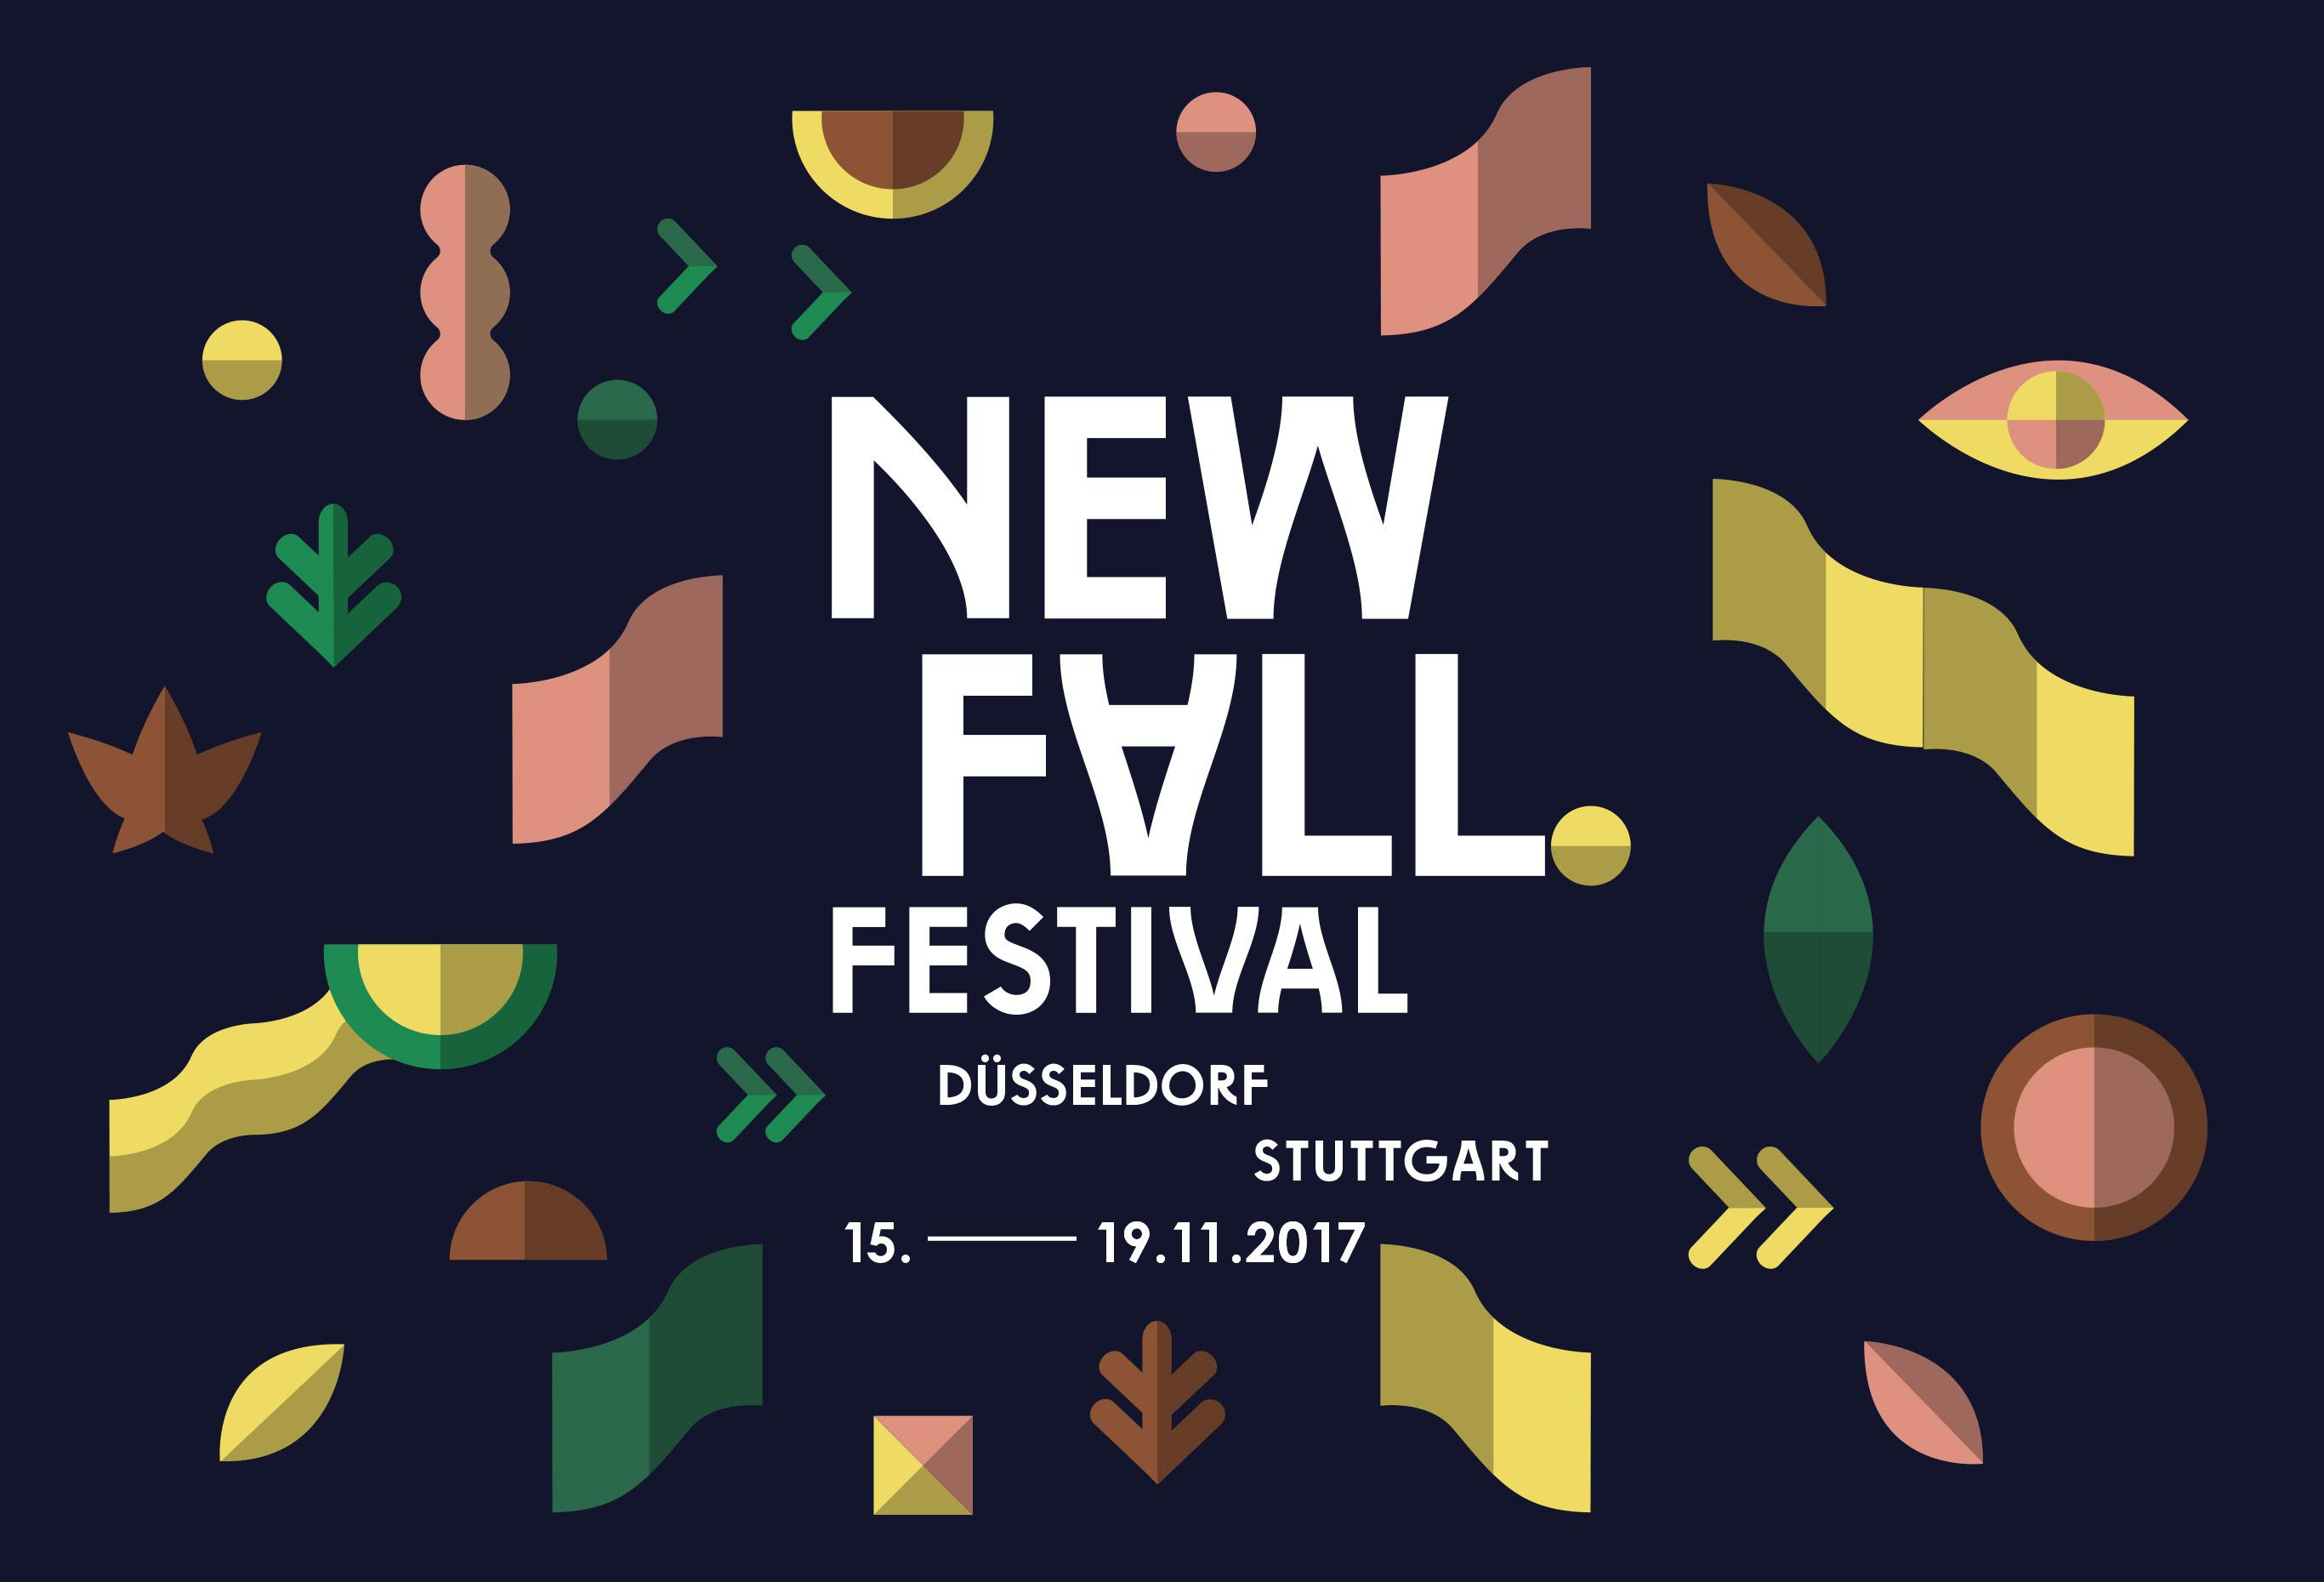 NEW FALL FESTIVAL 2017